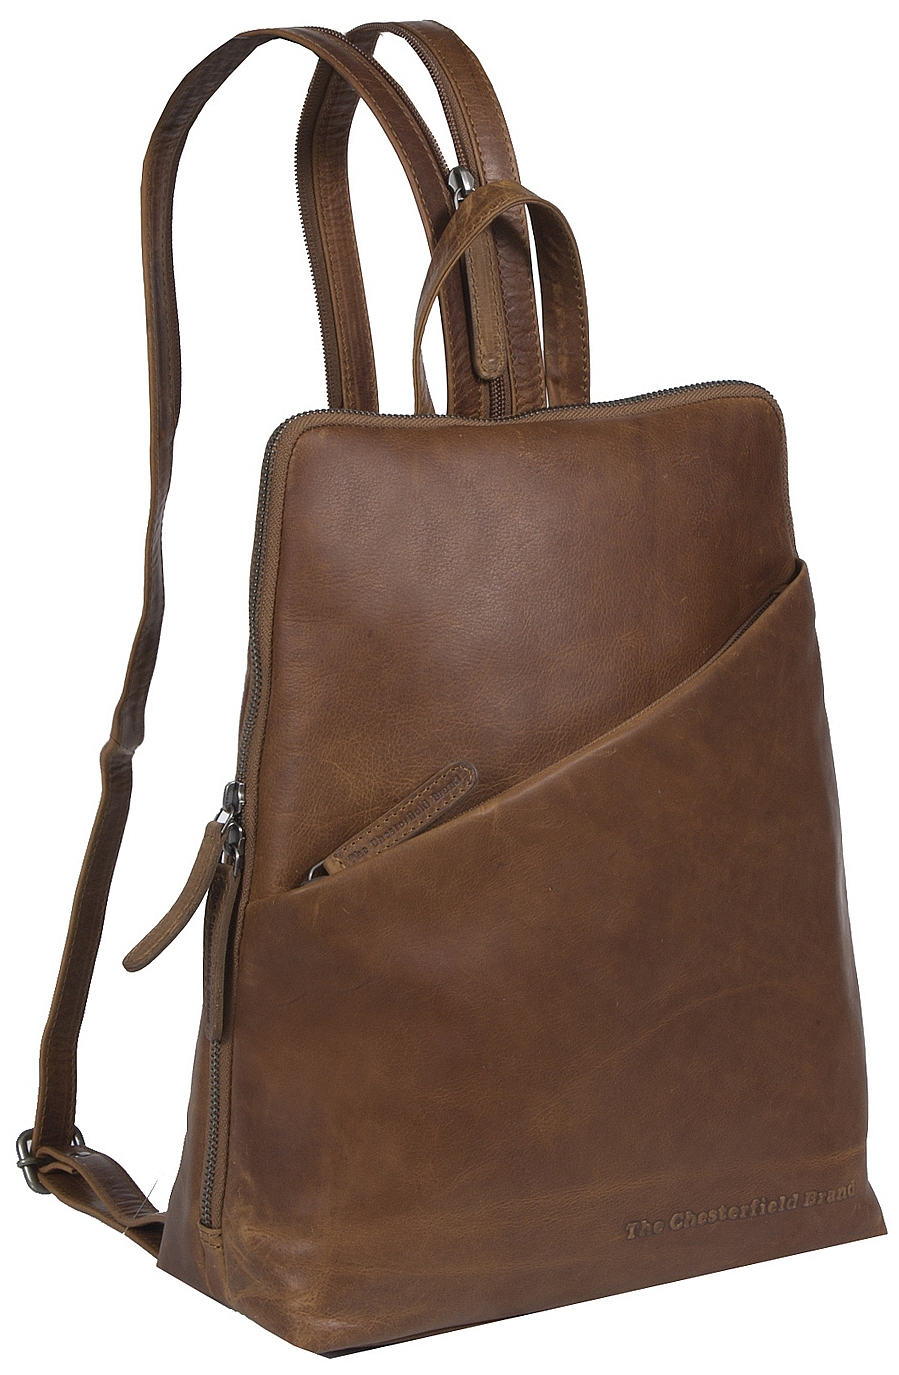 2c69277716b The Chesterfield Brand Dámský kožený batoh do města Amanda C58.014731 koňak